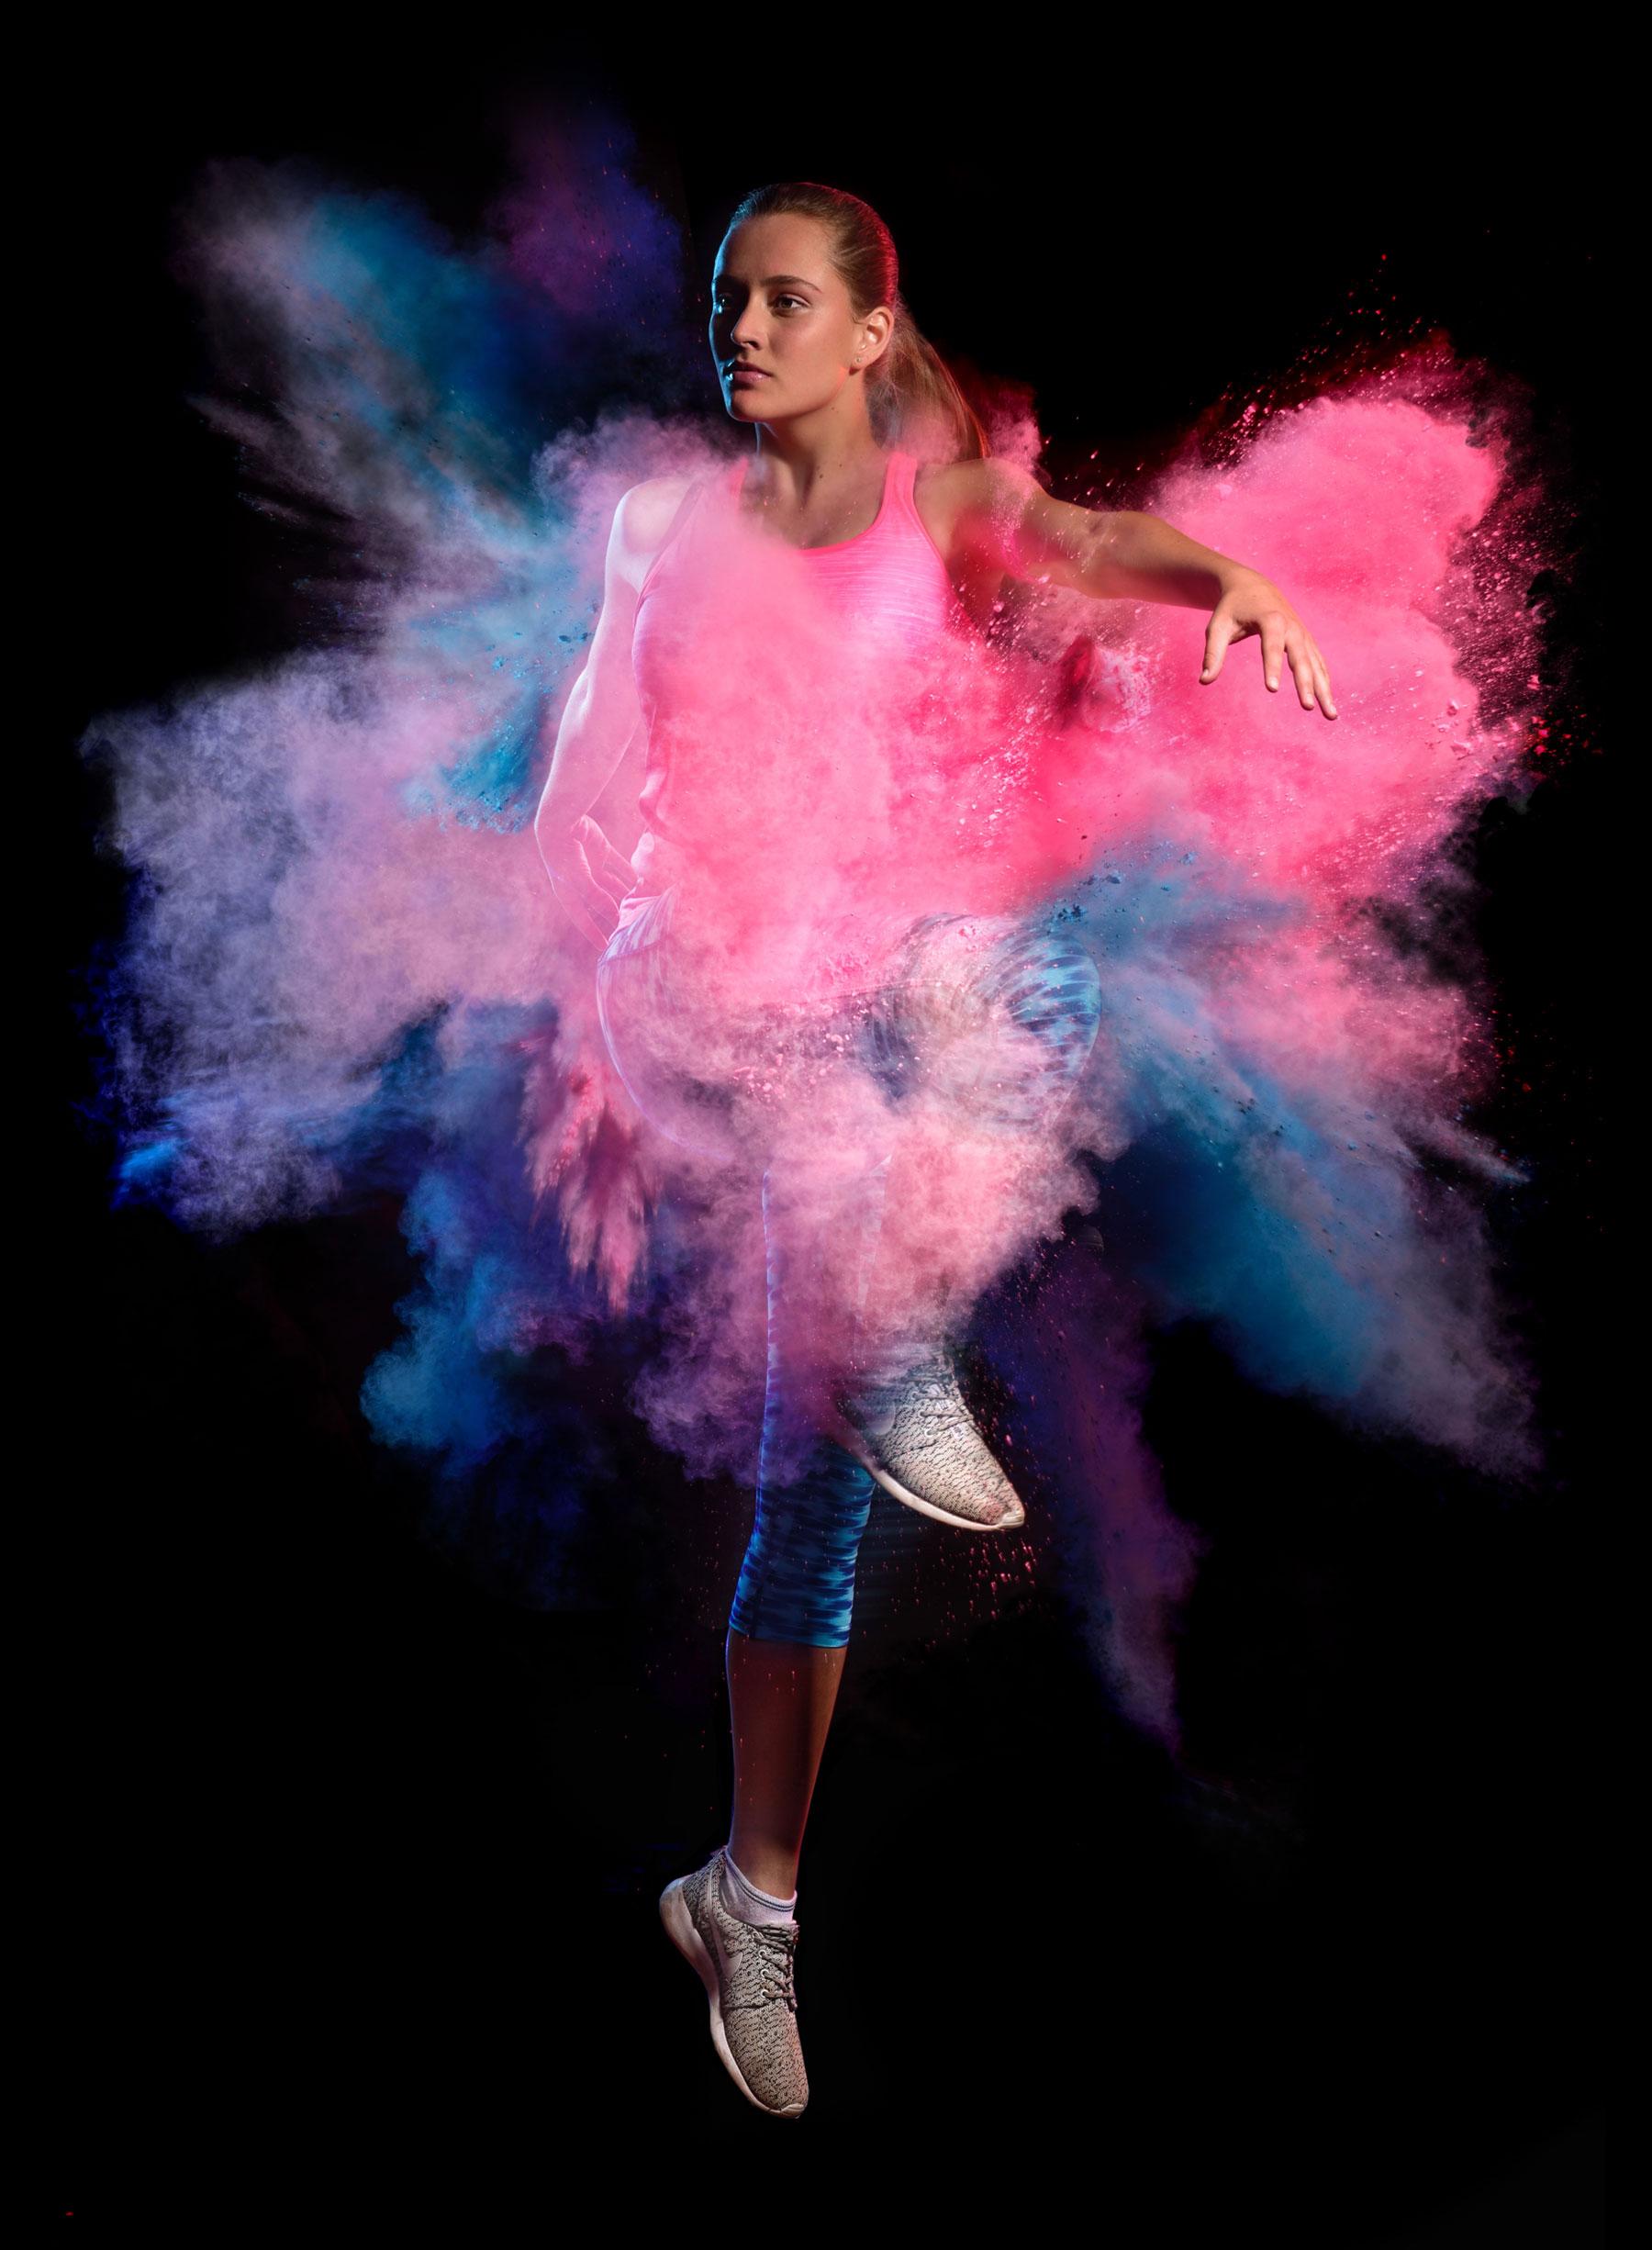 commercial-powder-shoot-fitness-photography-brandon-barnard-professional-photographer.jpg